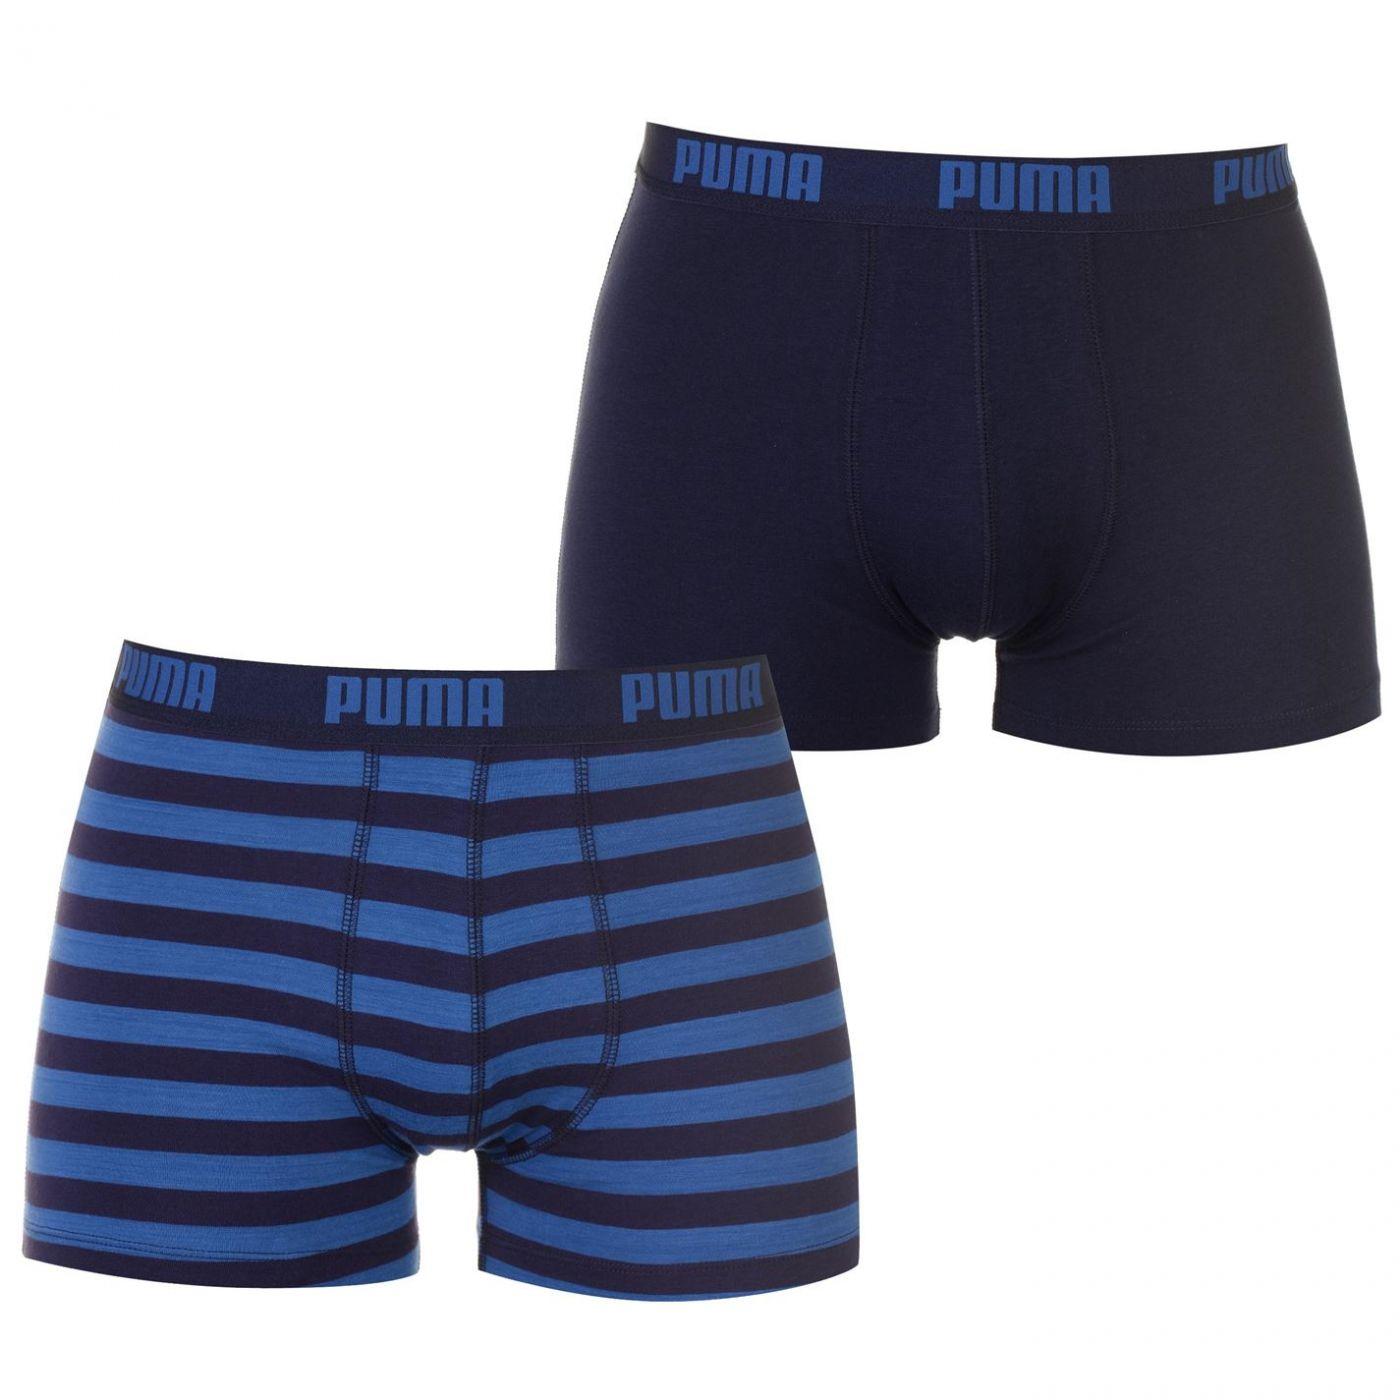 Puma Stripe Boxer Shorts 2 Pack Mens